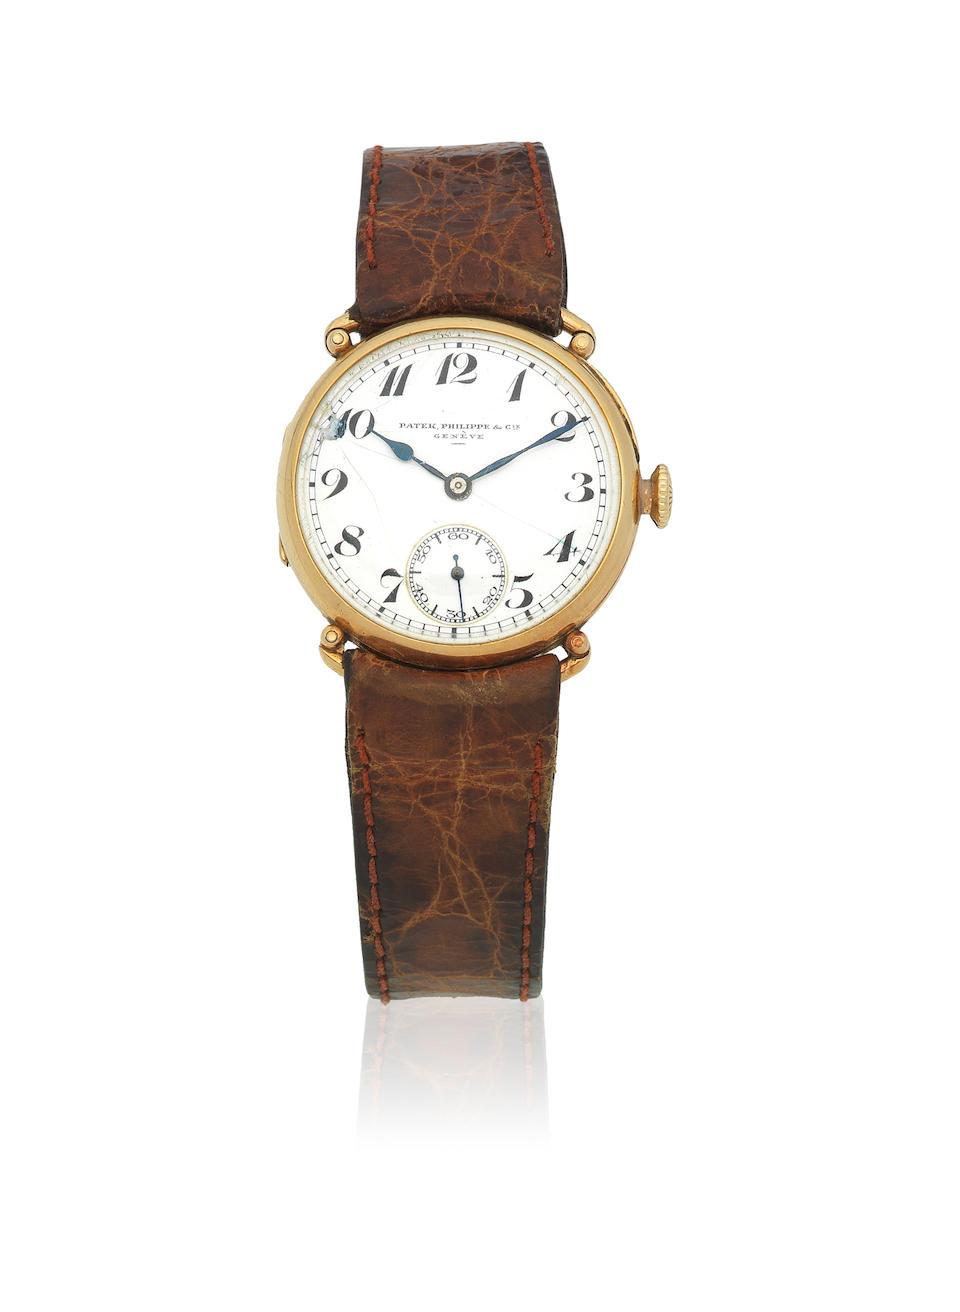 Patek Philippe. An 18K gold manual wind wristwatch Circa 1925